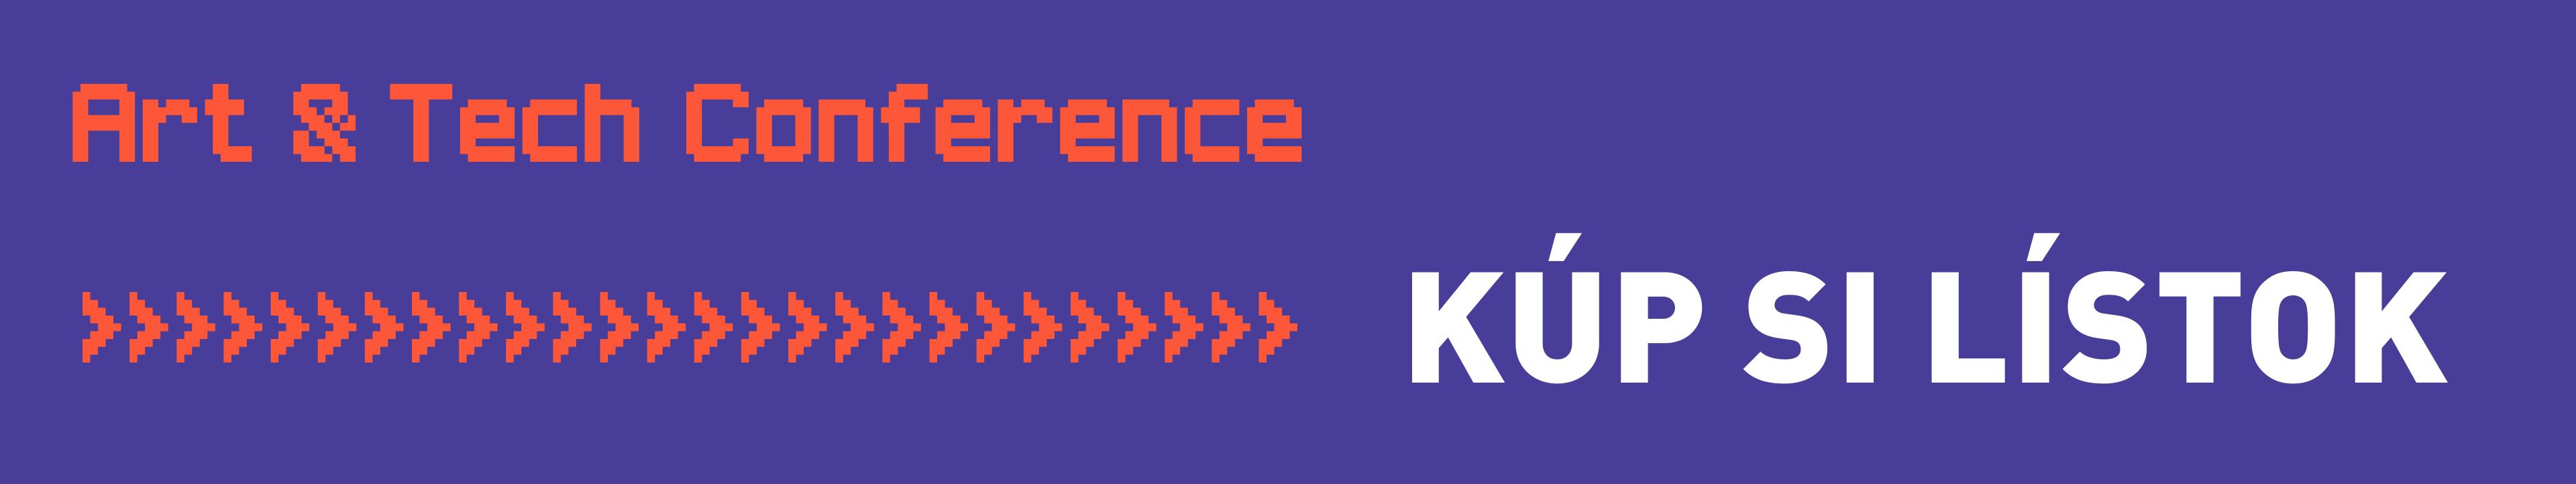 Art&Tech Conference